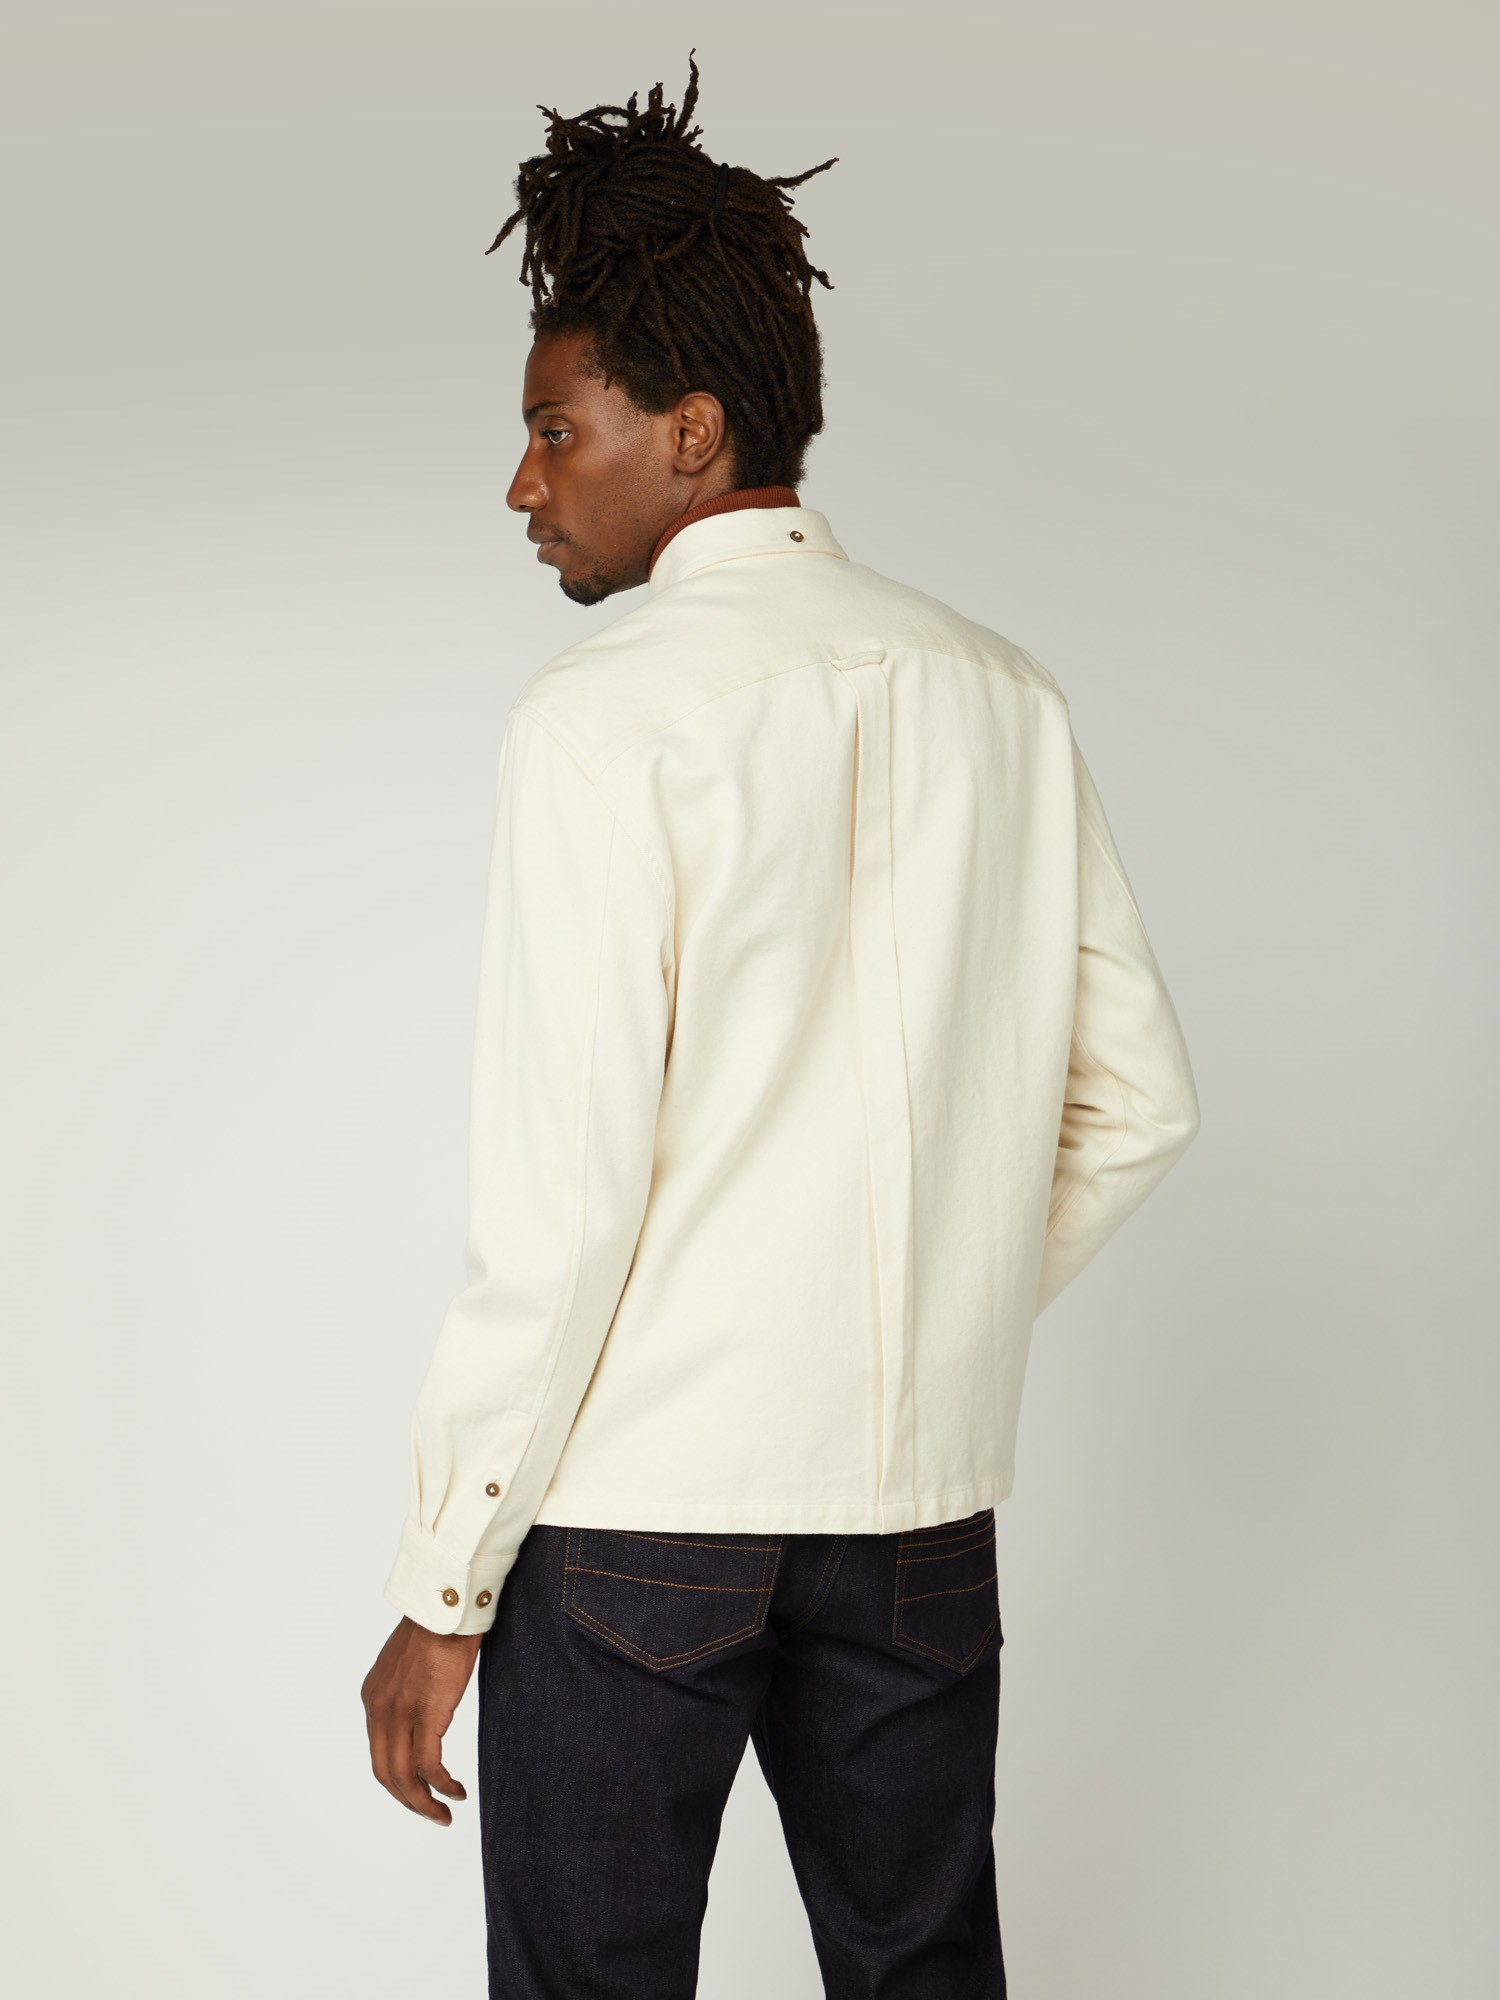 Raw Cotton Chore Jacket